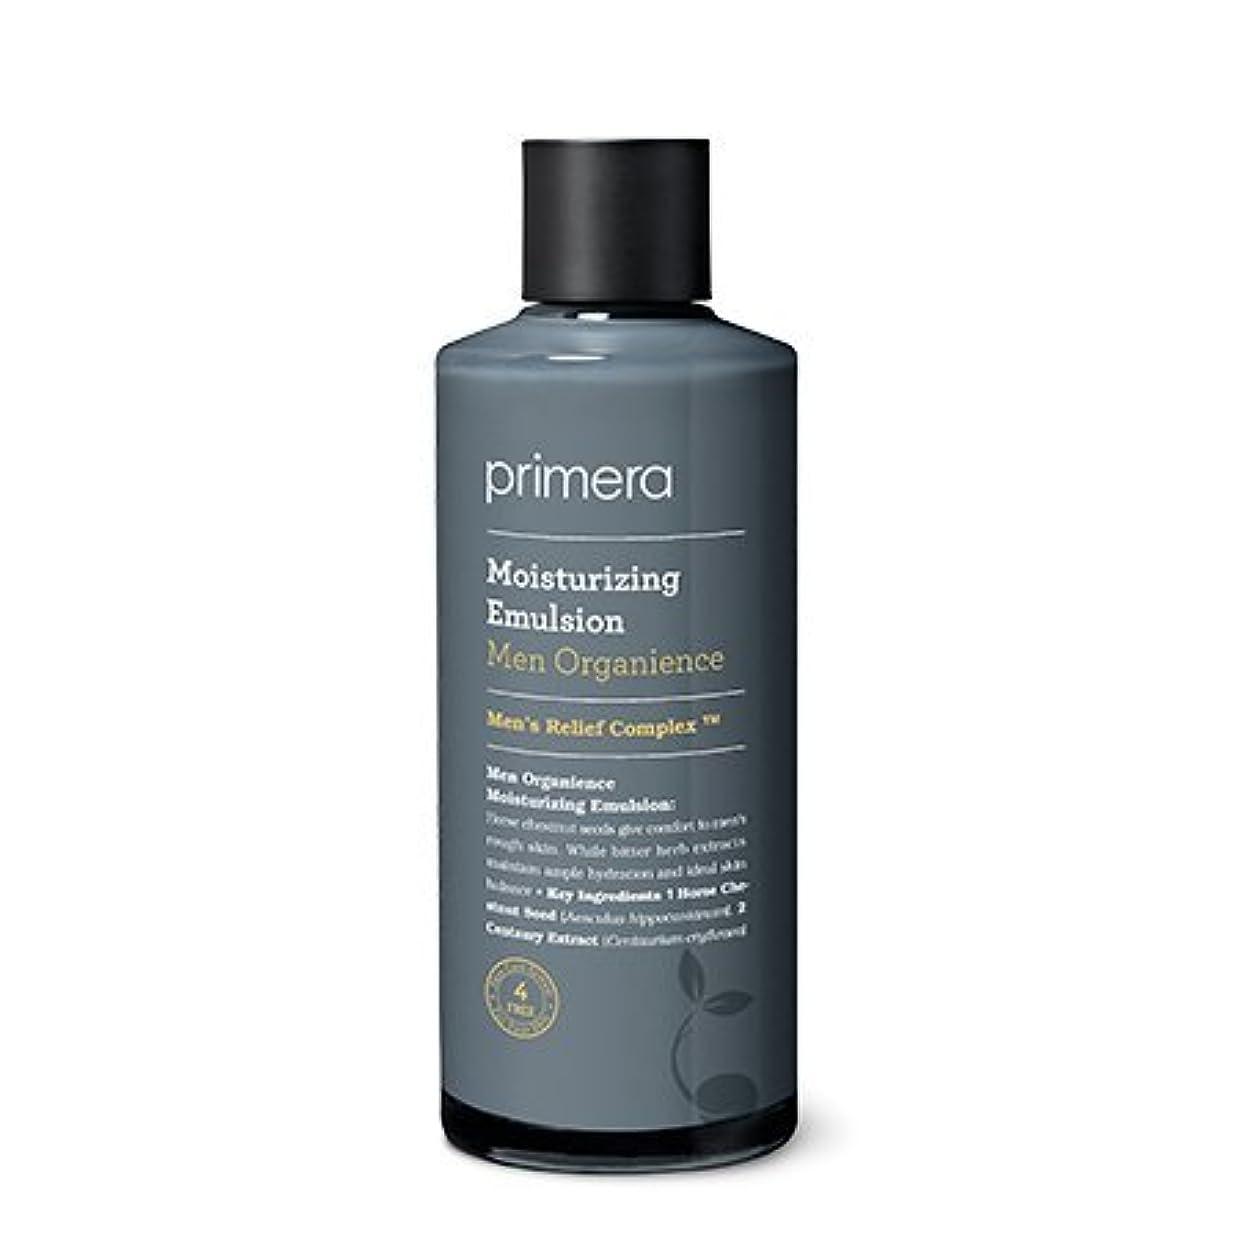 【Primera】Men Organience Moisturizing Emulsion - 150ml (韓国直送品) (SHOPPINGINSTAGRAM)